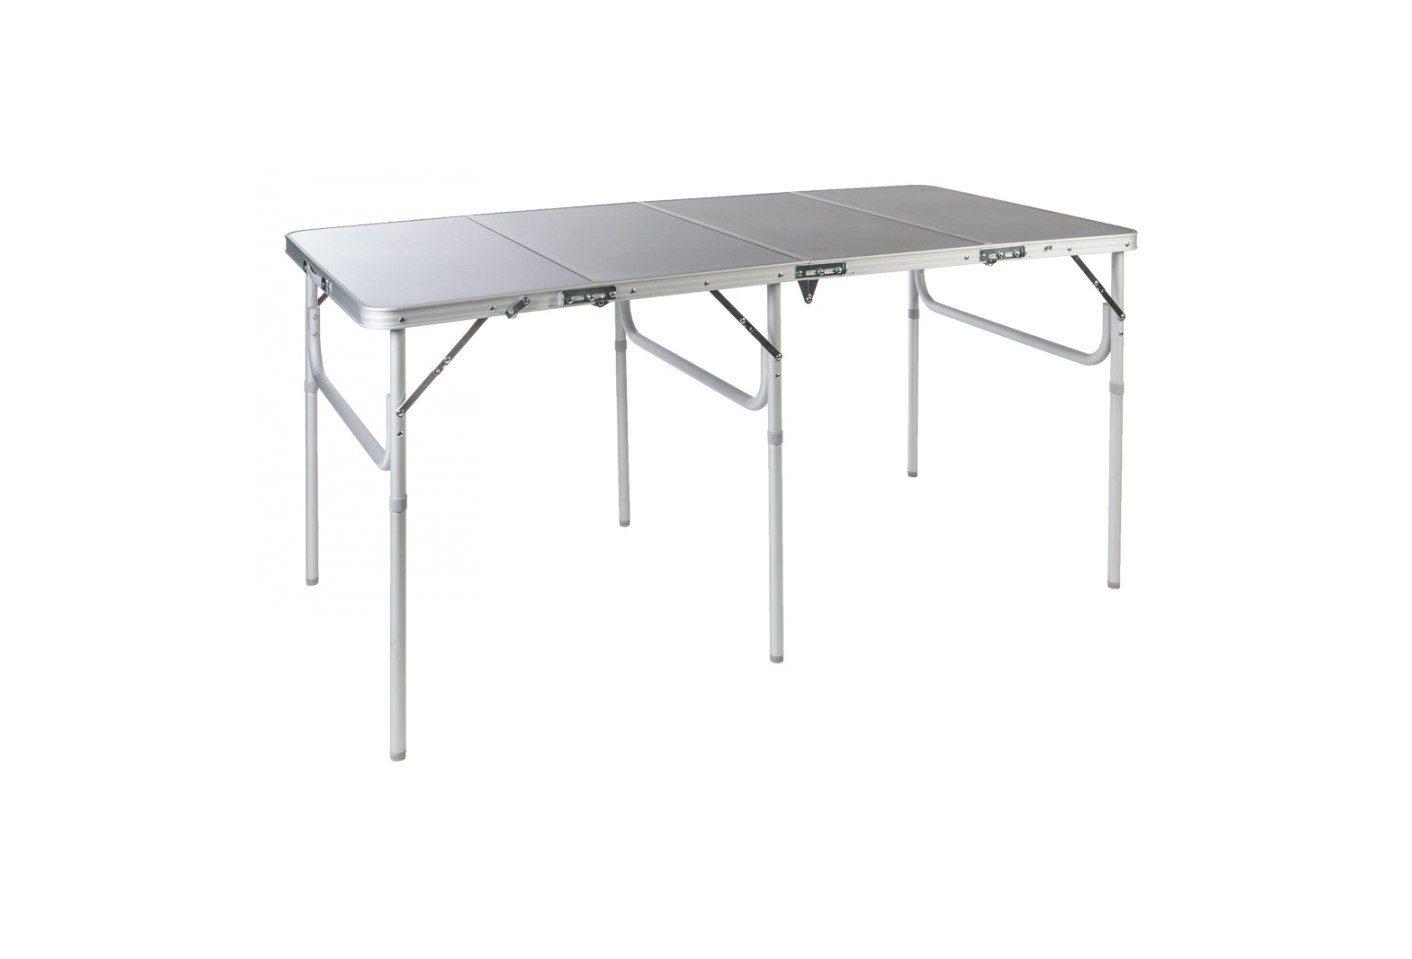 Vango Granite Duo Table 160cm high table